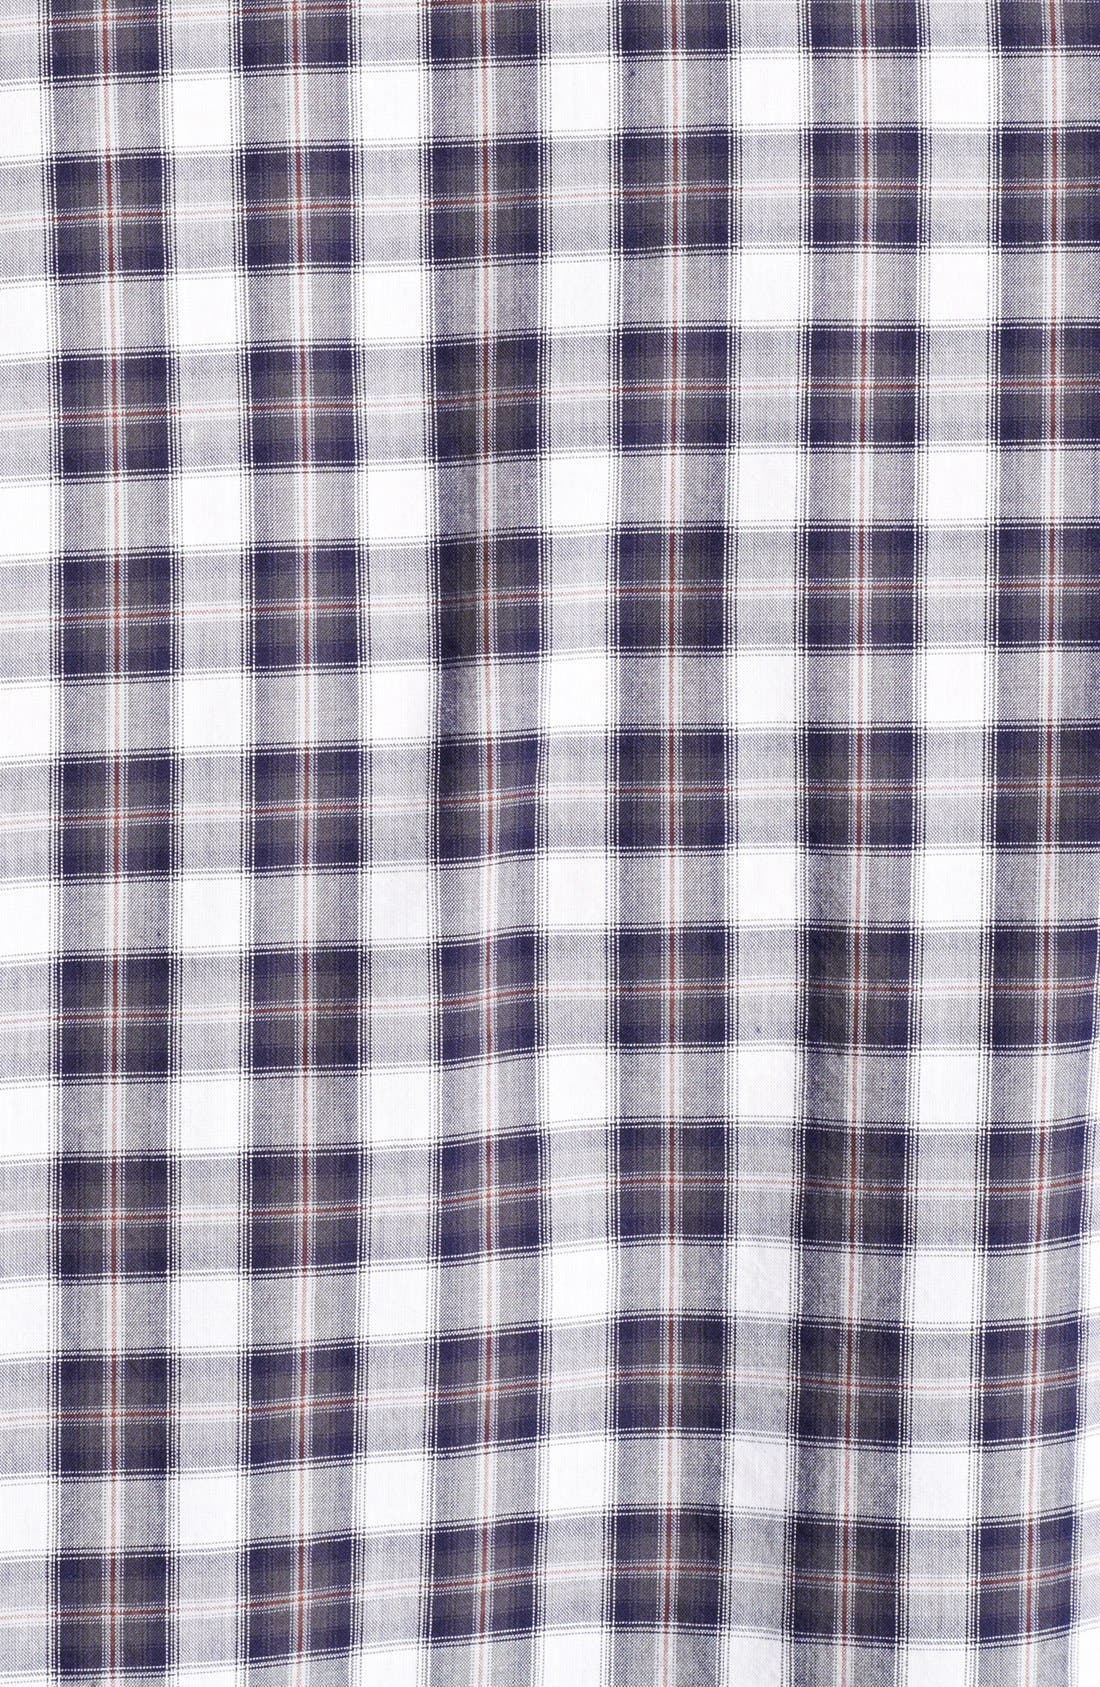 Alternate Image 3  - Billy Reid 'Tuscumbia' Plaid Shirt